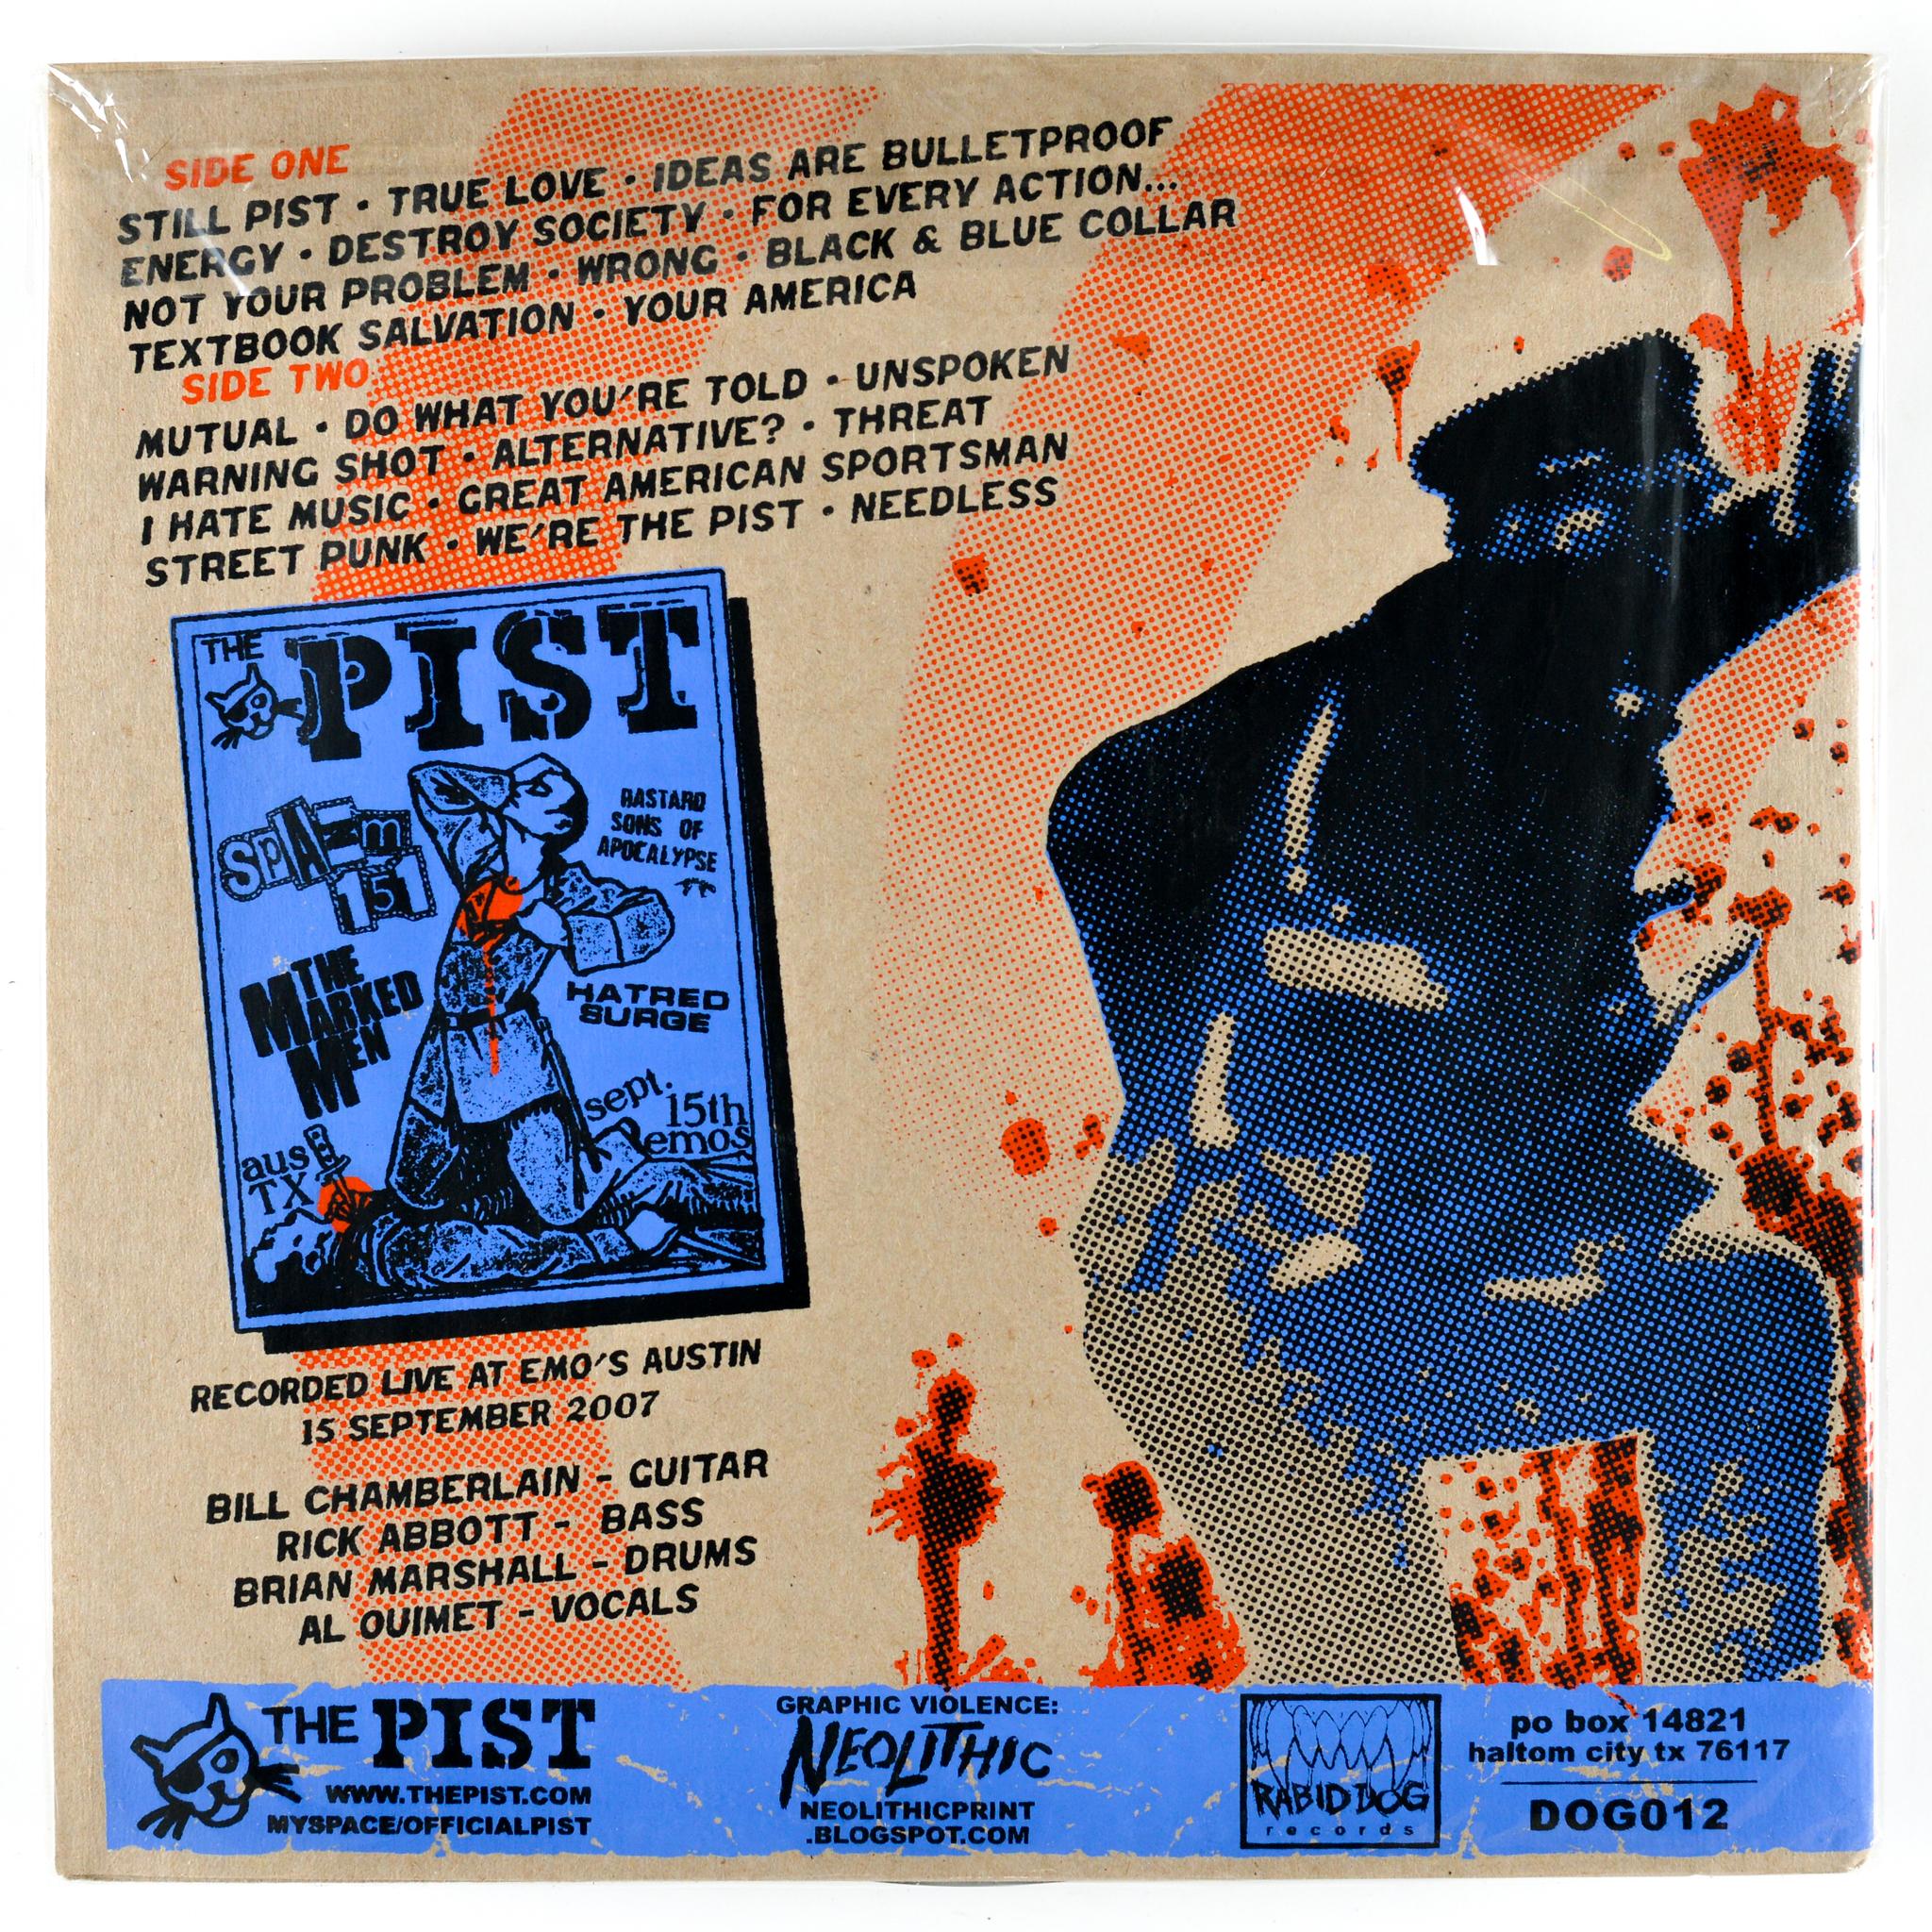 PIST - LIVE & STILL PIST